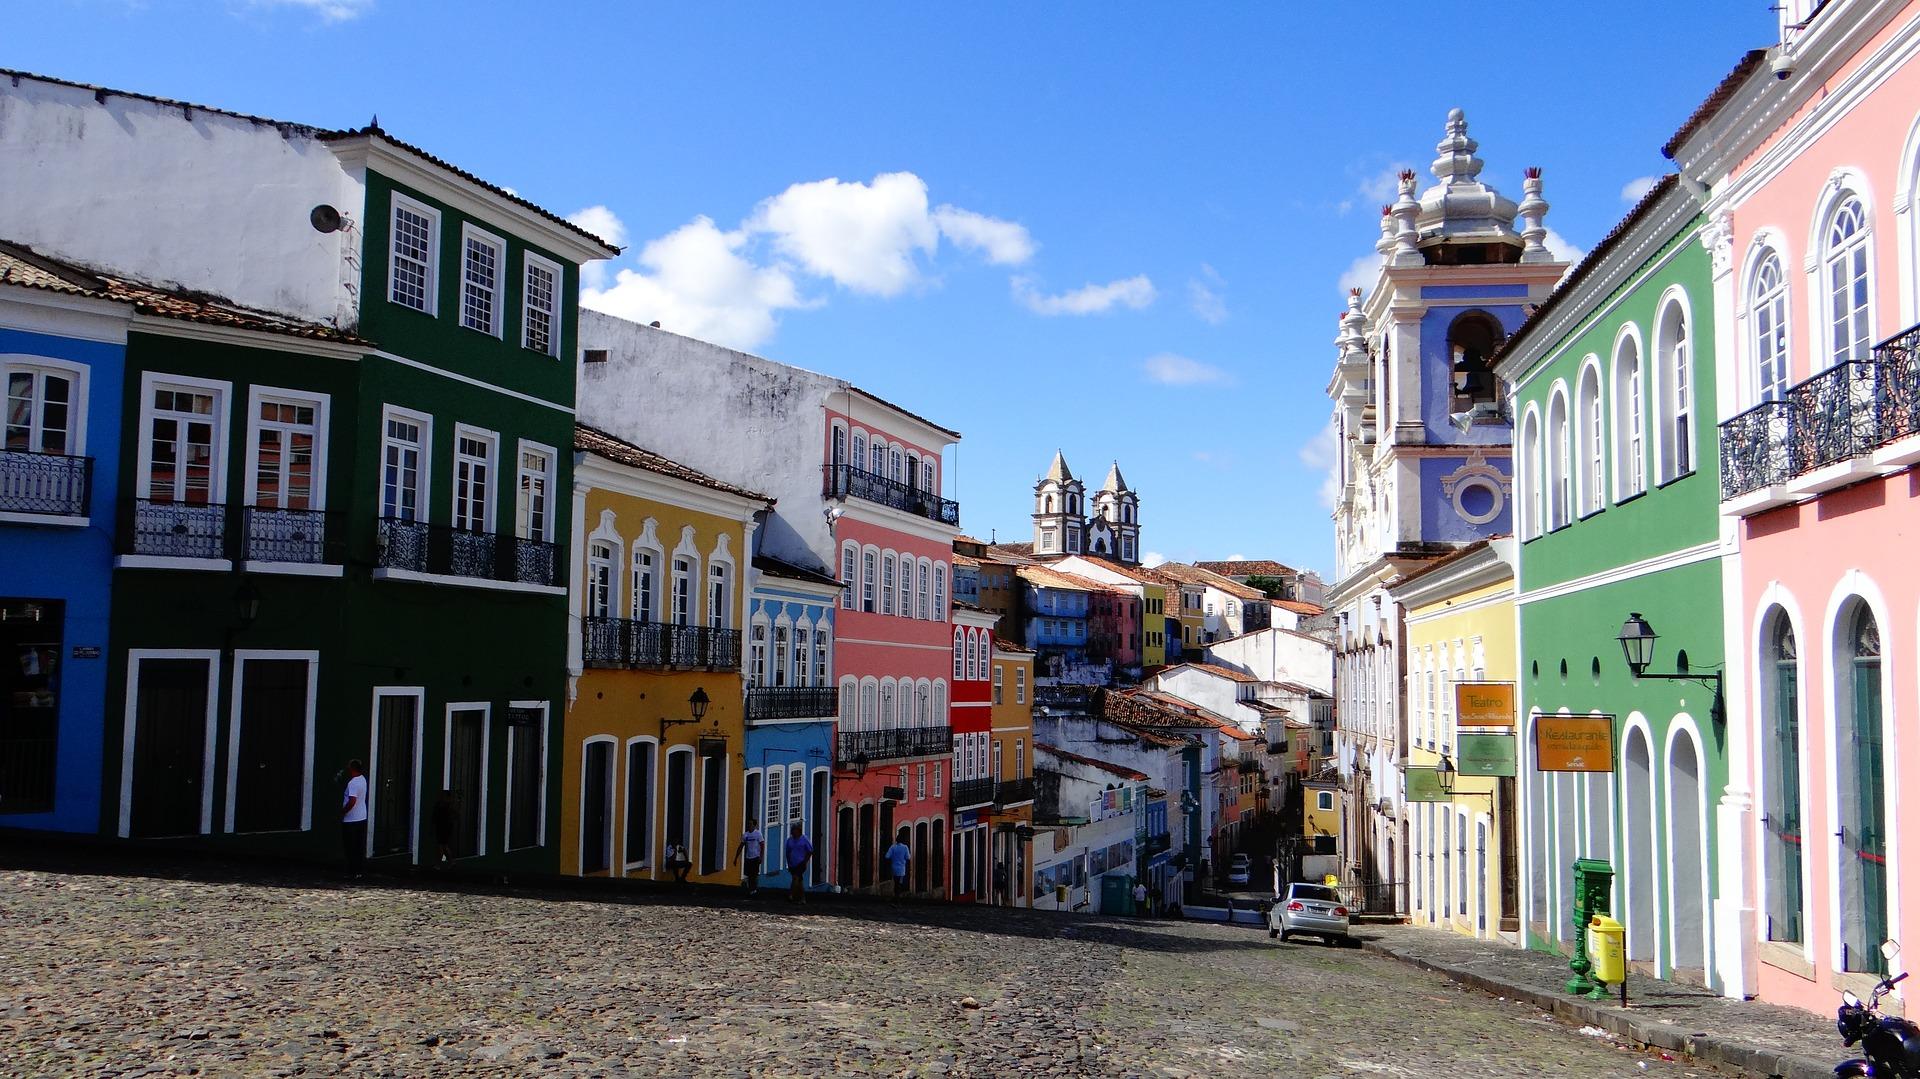 Sonne, Samba, Südamerika - Bild